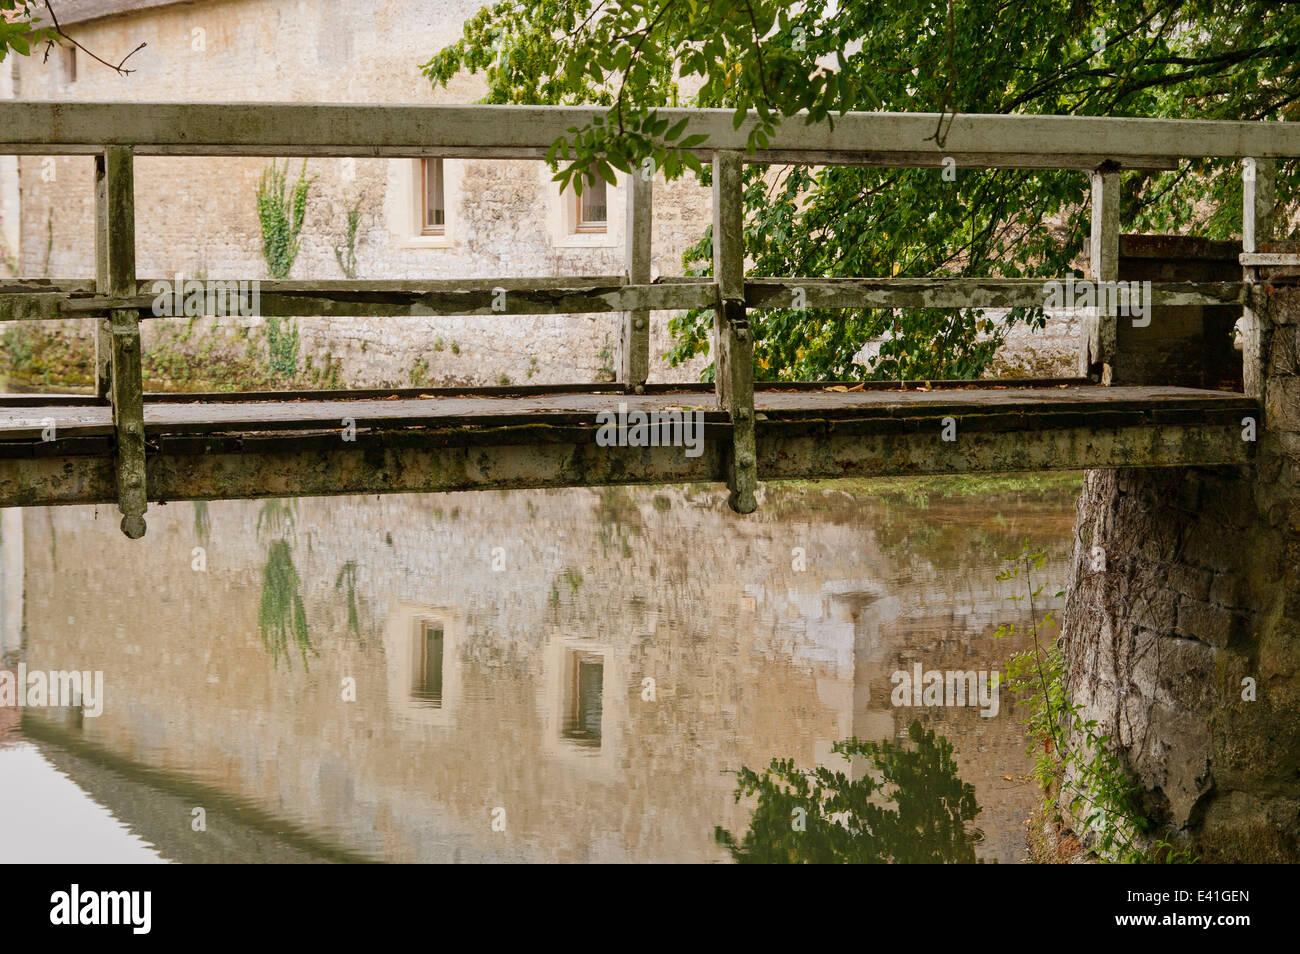 Footbridge over moat - France. - Stock Image